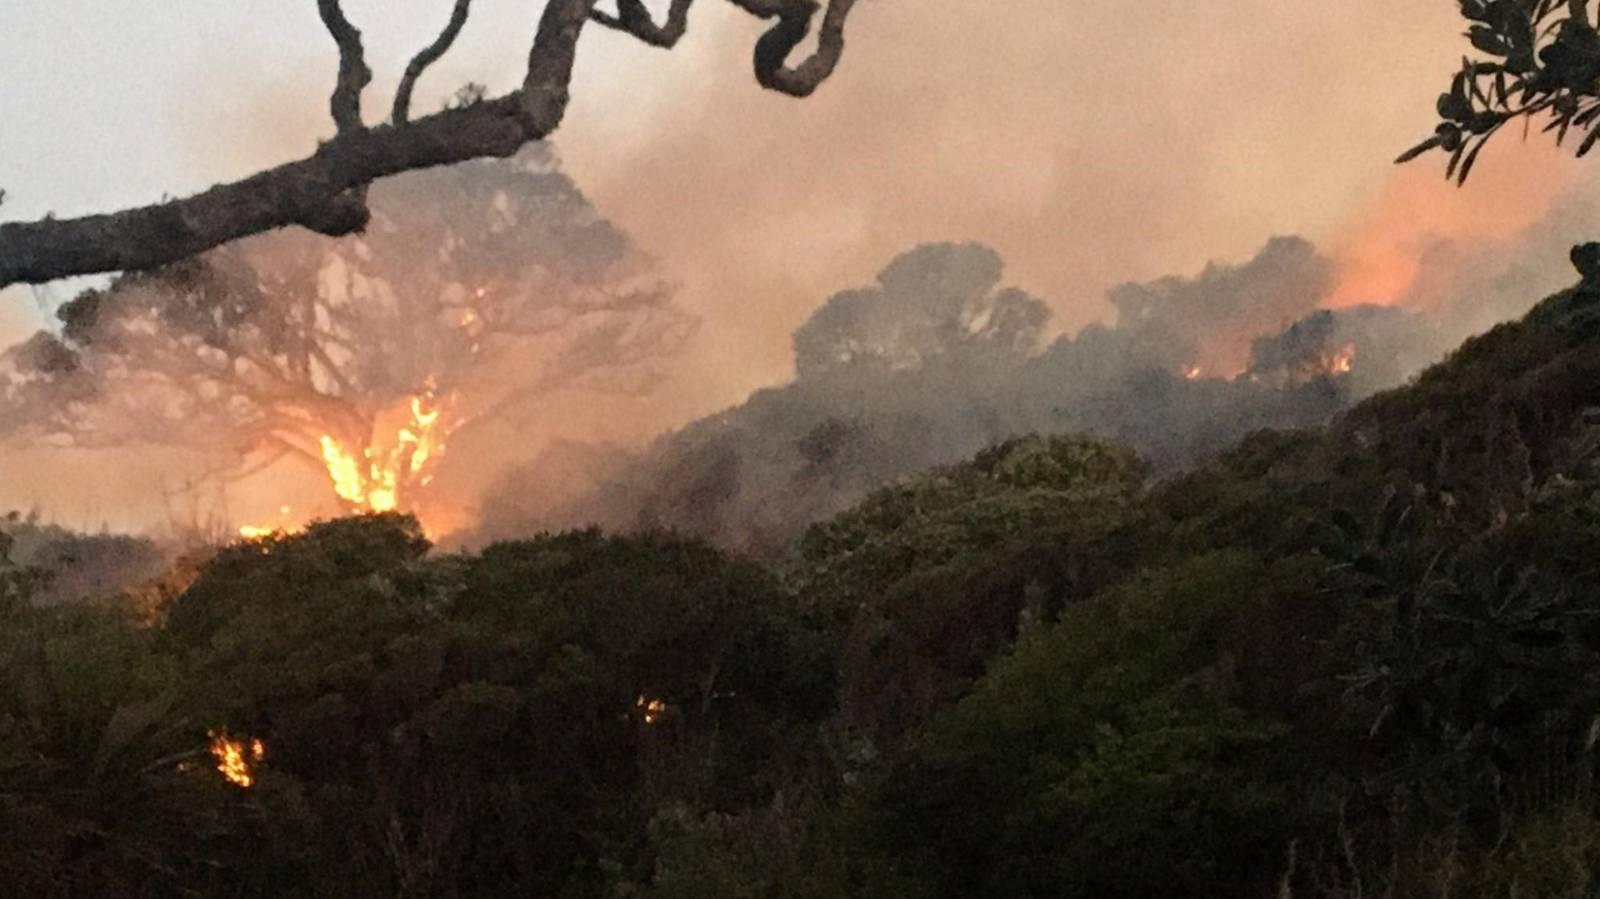 Suspicious fire burns through native bush in Northland, threatening homes